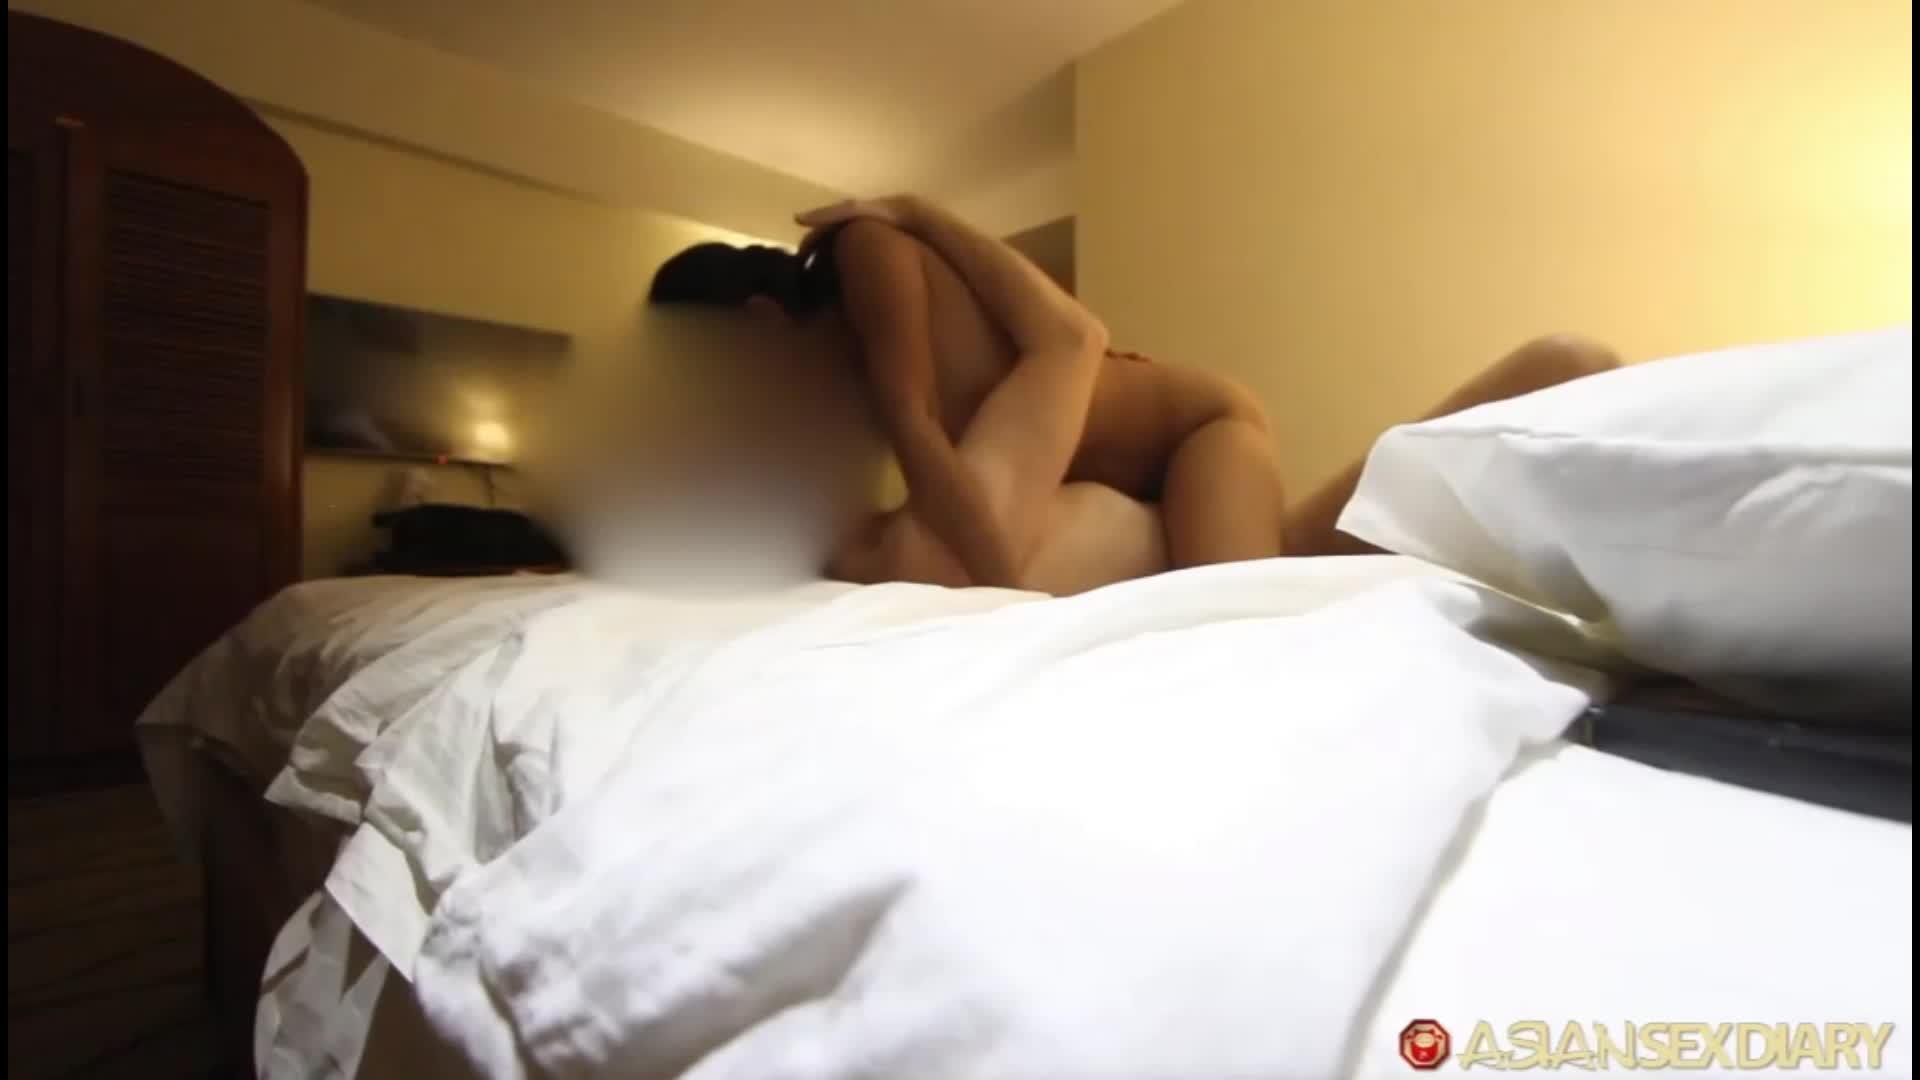 anal sex group hardcore Tete - Tete Phuket 2020 new [FullHD 1080p], cumshot on asian girl porn - k2s.tv